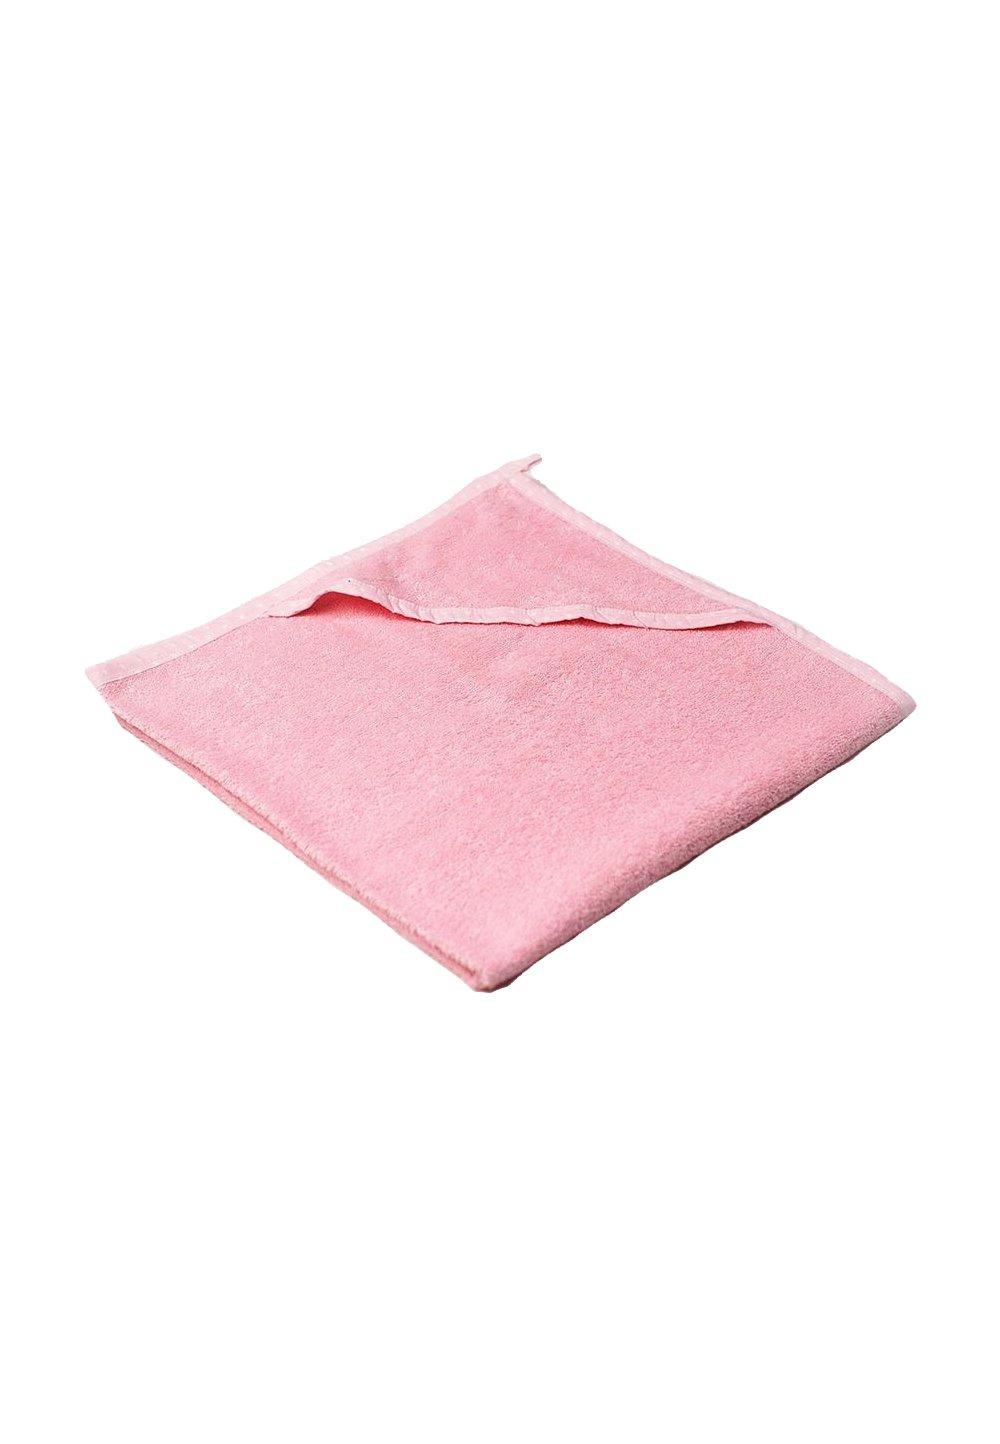 Prosop baie cu gluga, bumbac,roz, 80x100cm imagine